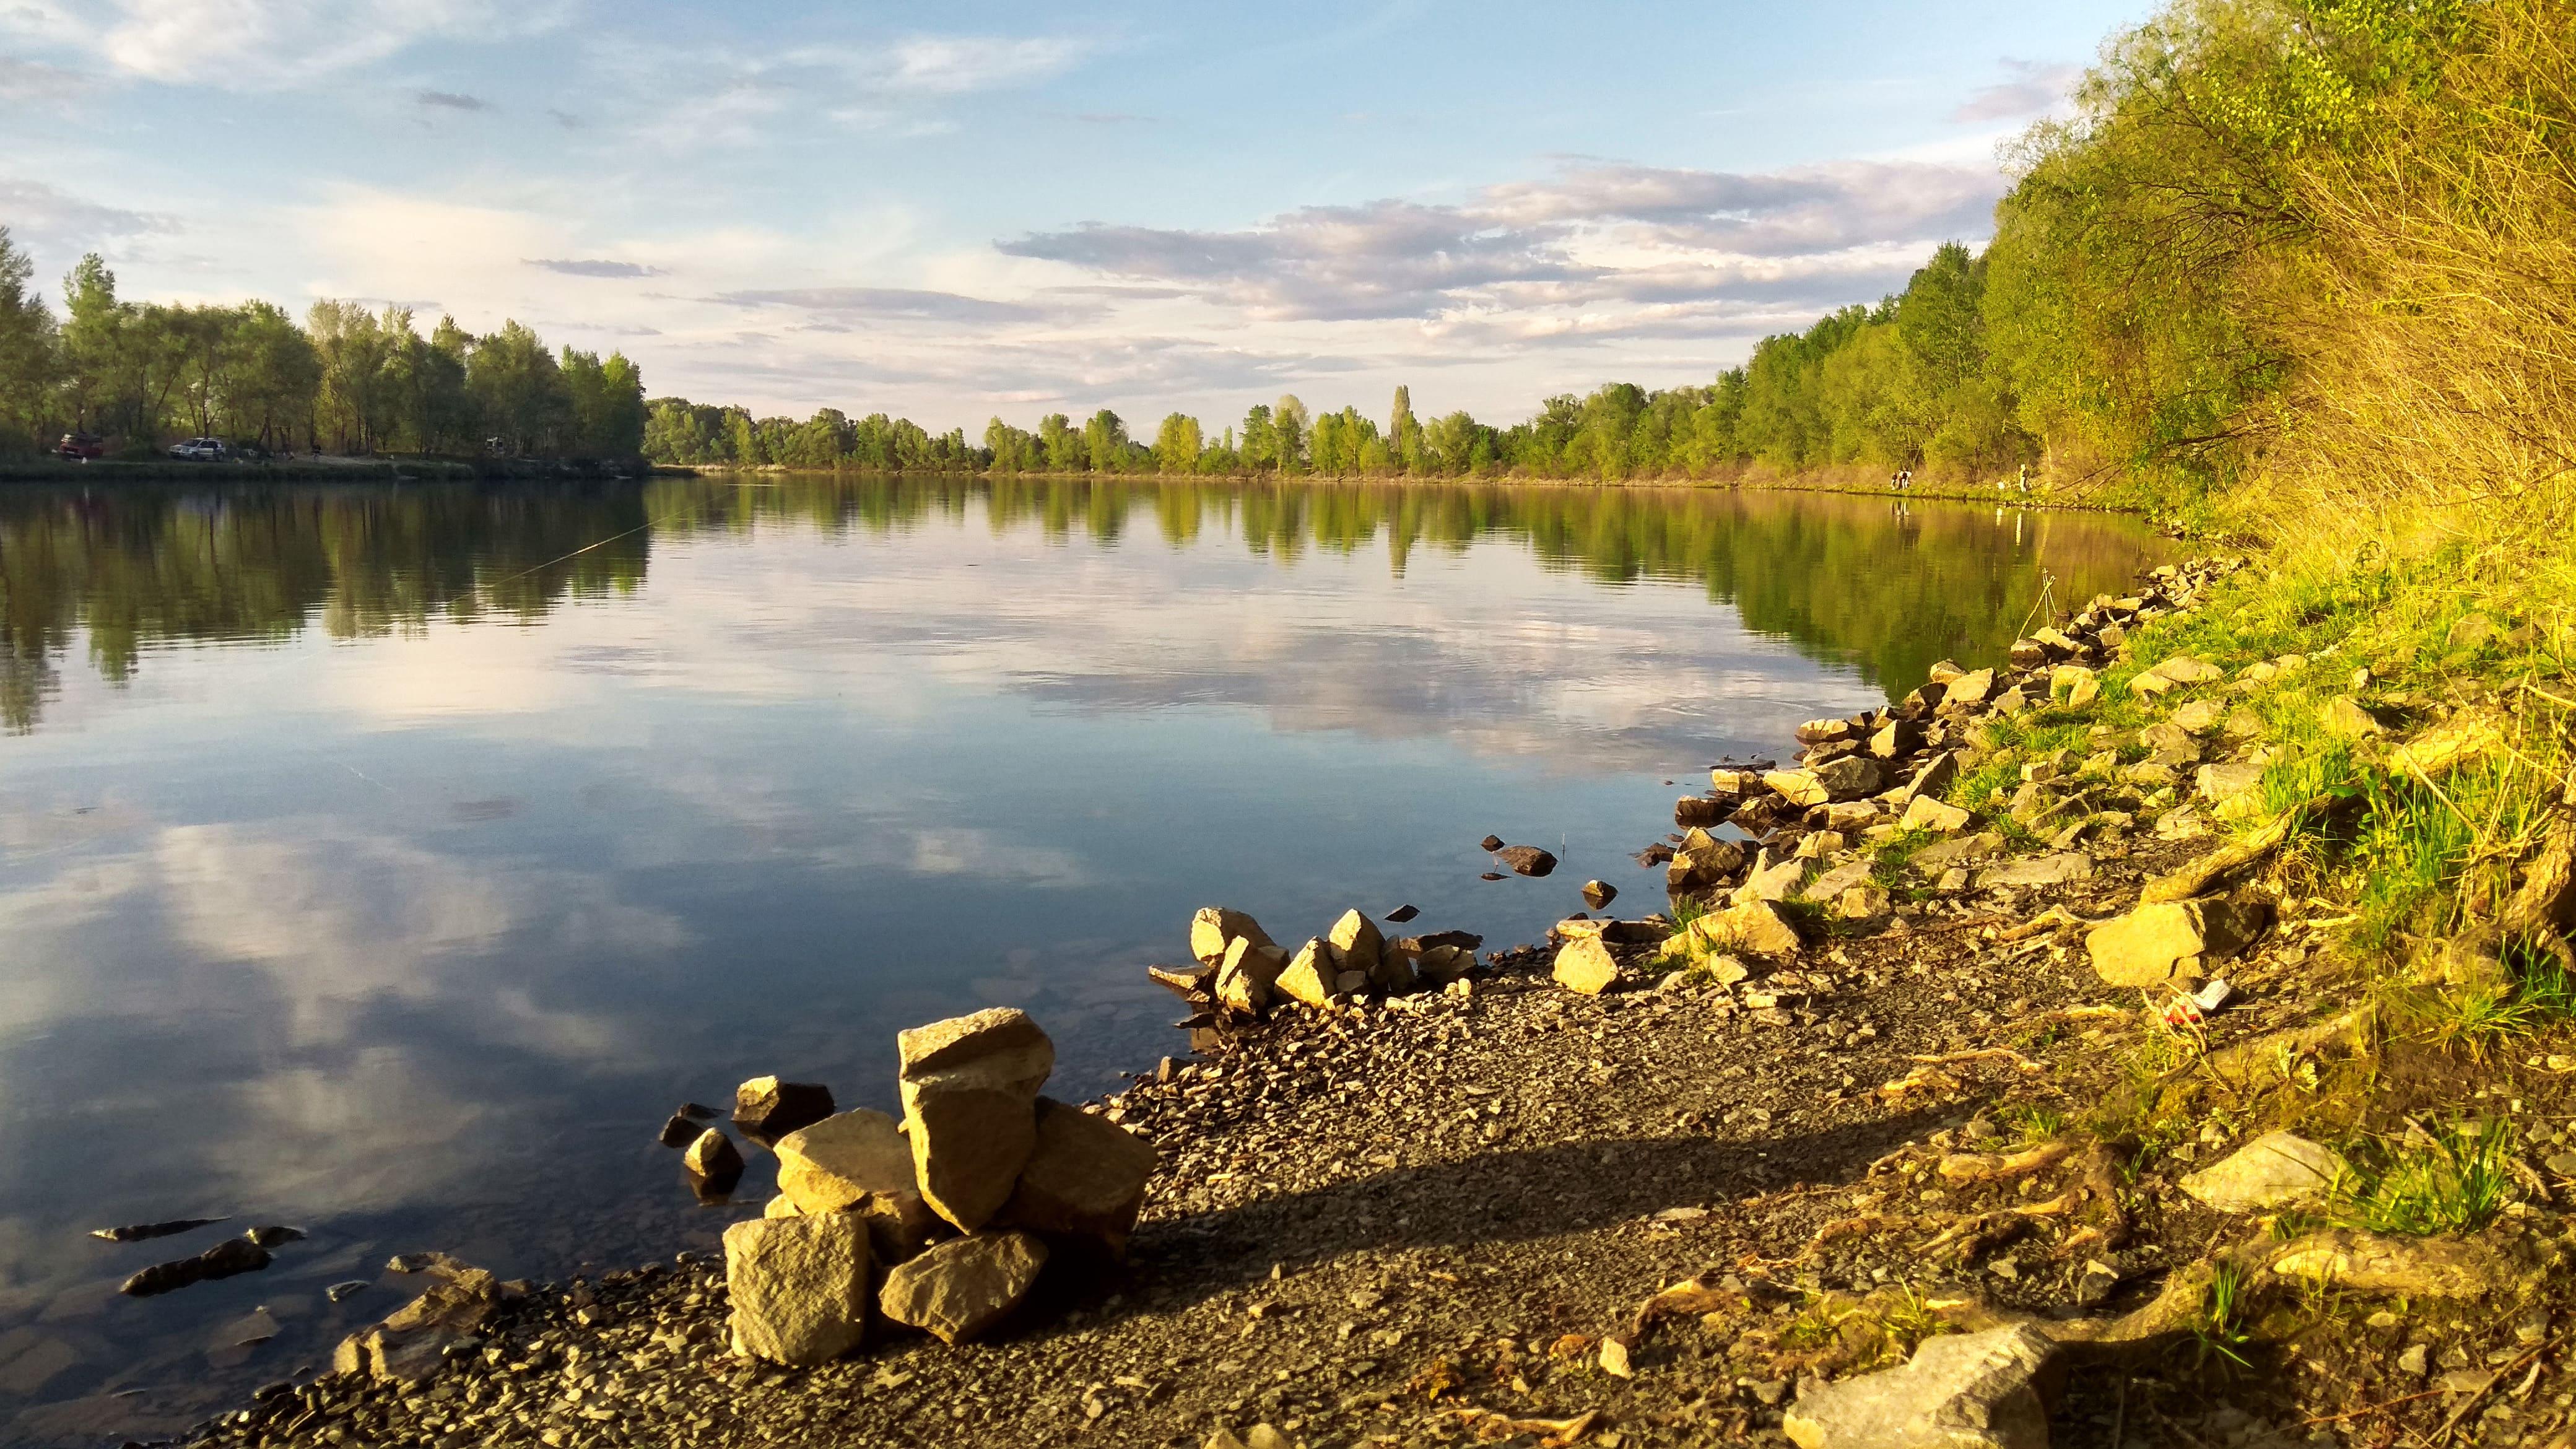 HDoboi.Kiev.ua - Каменистый берег у озера, природа, вода, камни